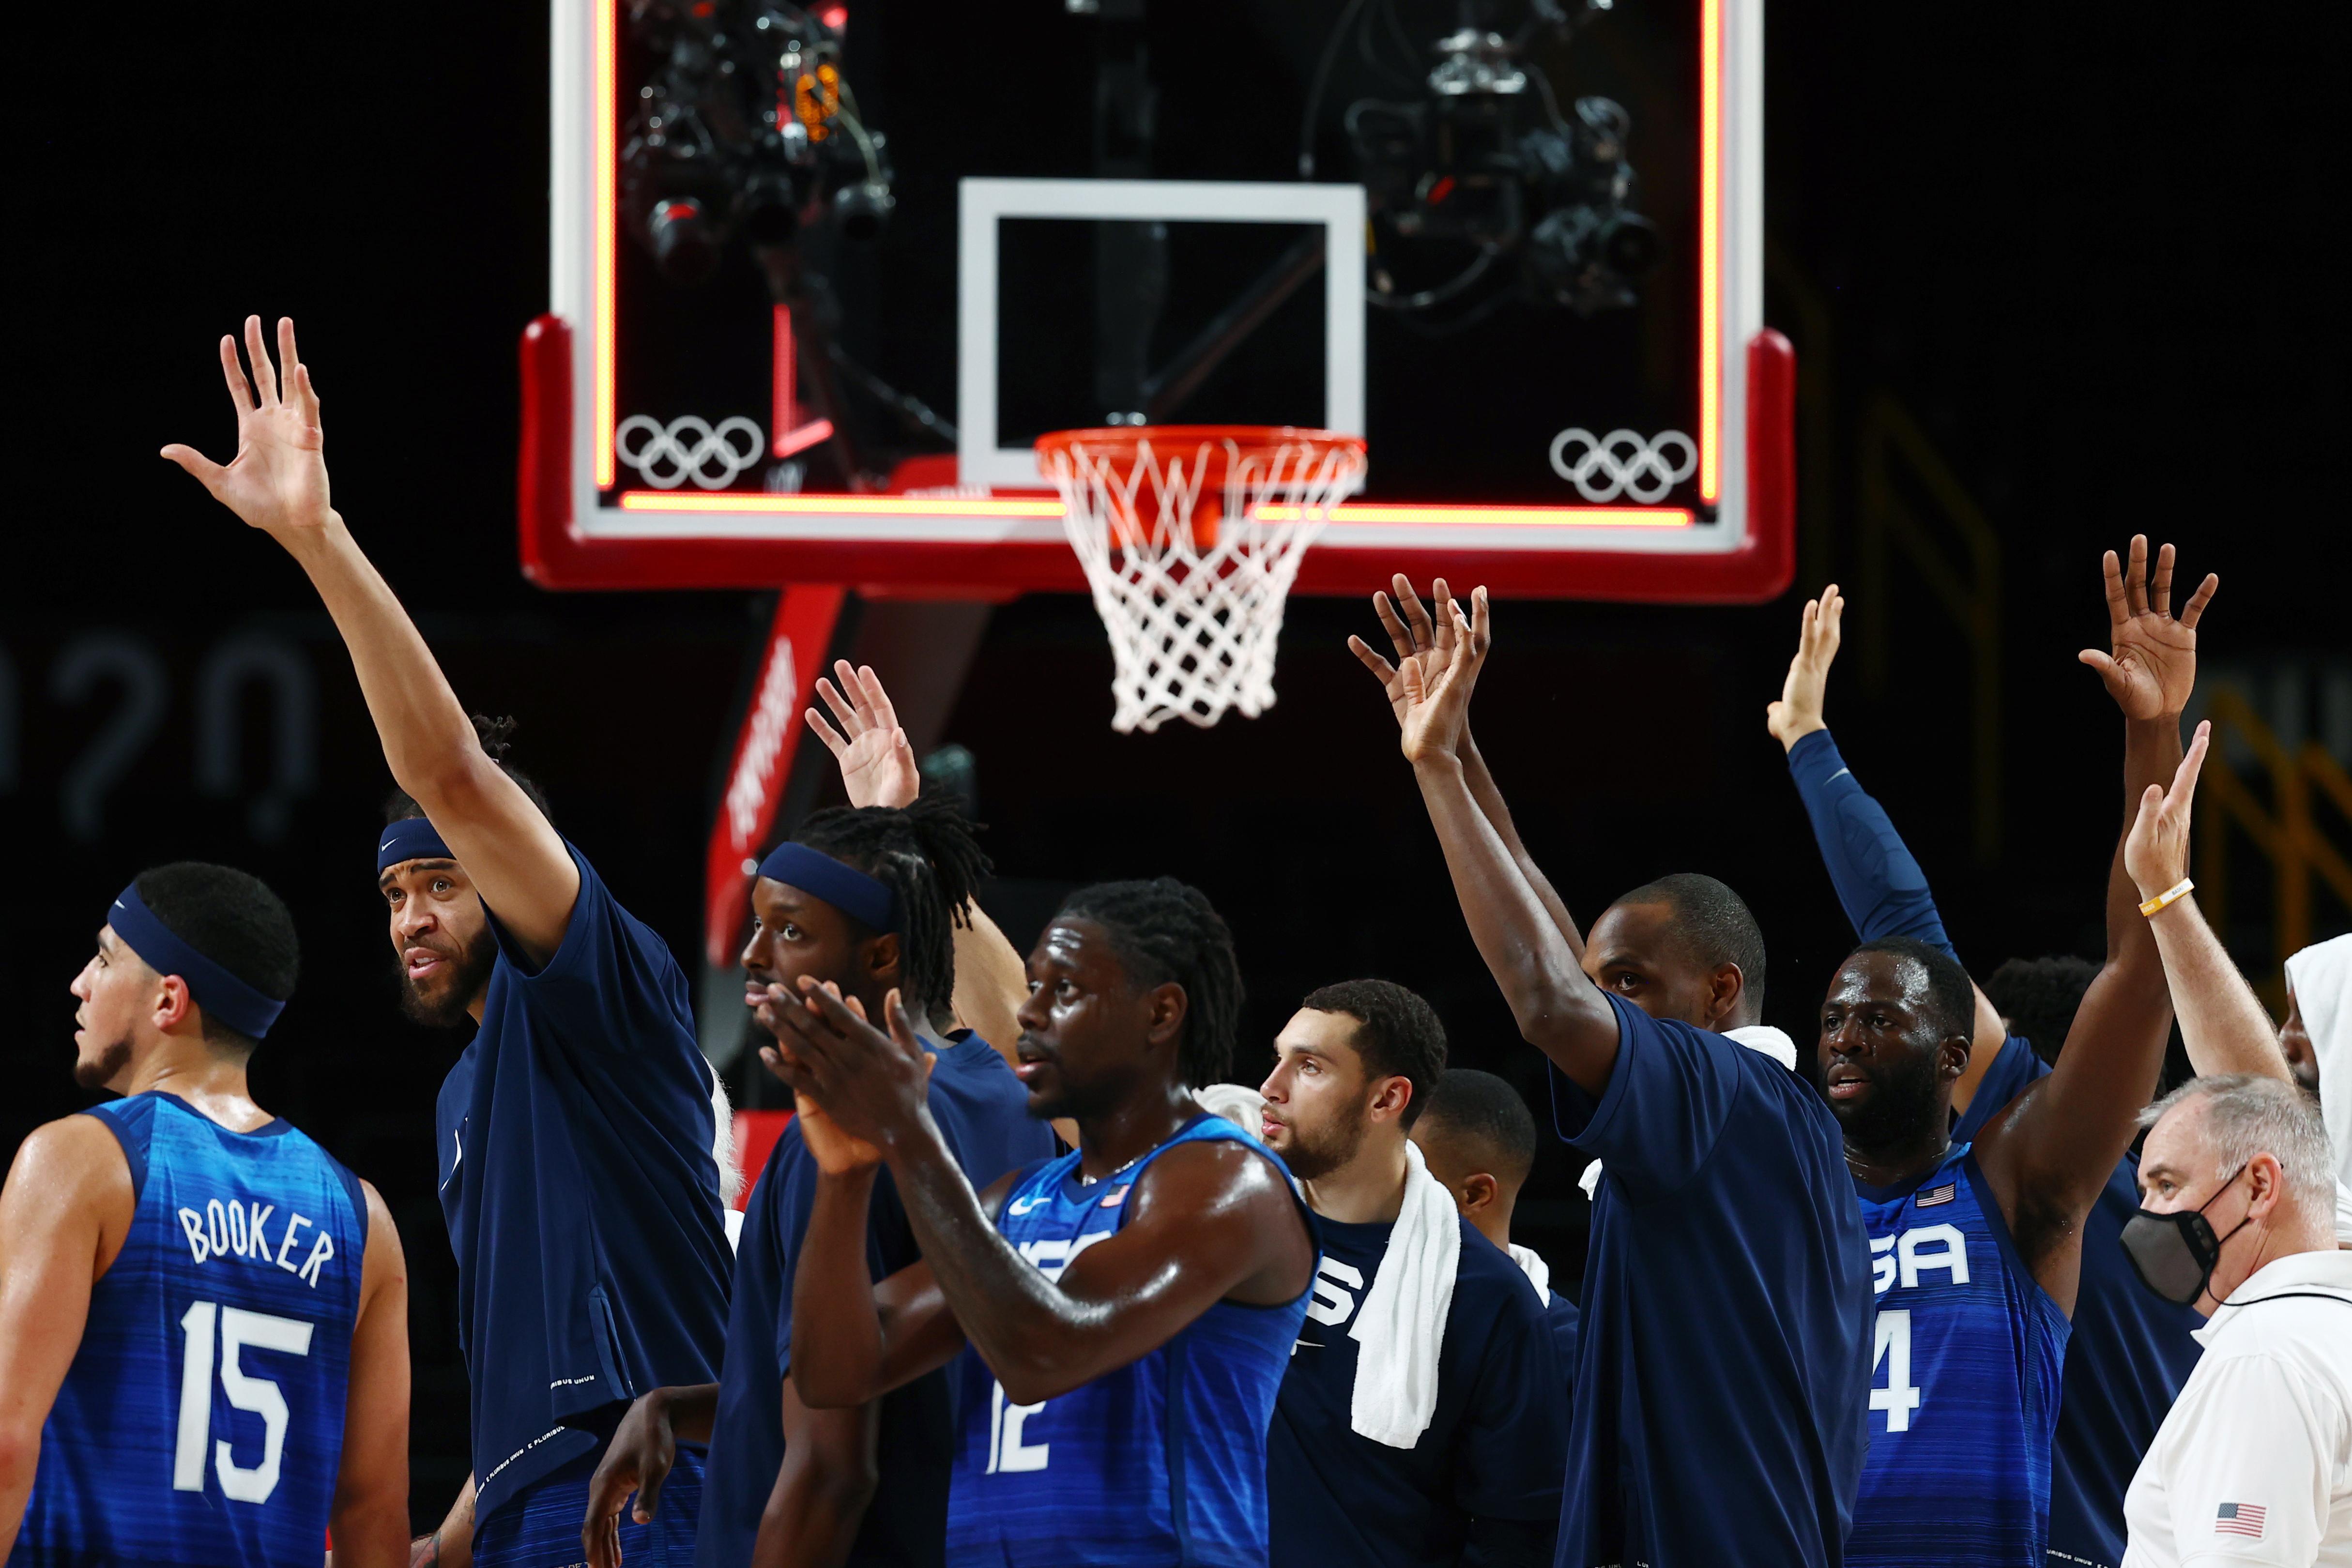 Tokyo 2020 Olympics - Basketball - Men - Quarterfinal - Spain v United States - Saitama Super Arena, Saitama, Japan - August 3, 2021. United States players celebrates after the match REUTERS/Sergio Perez